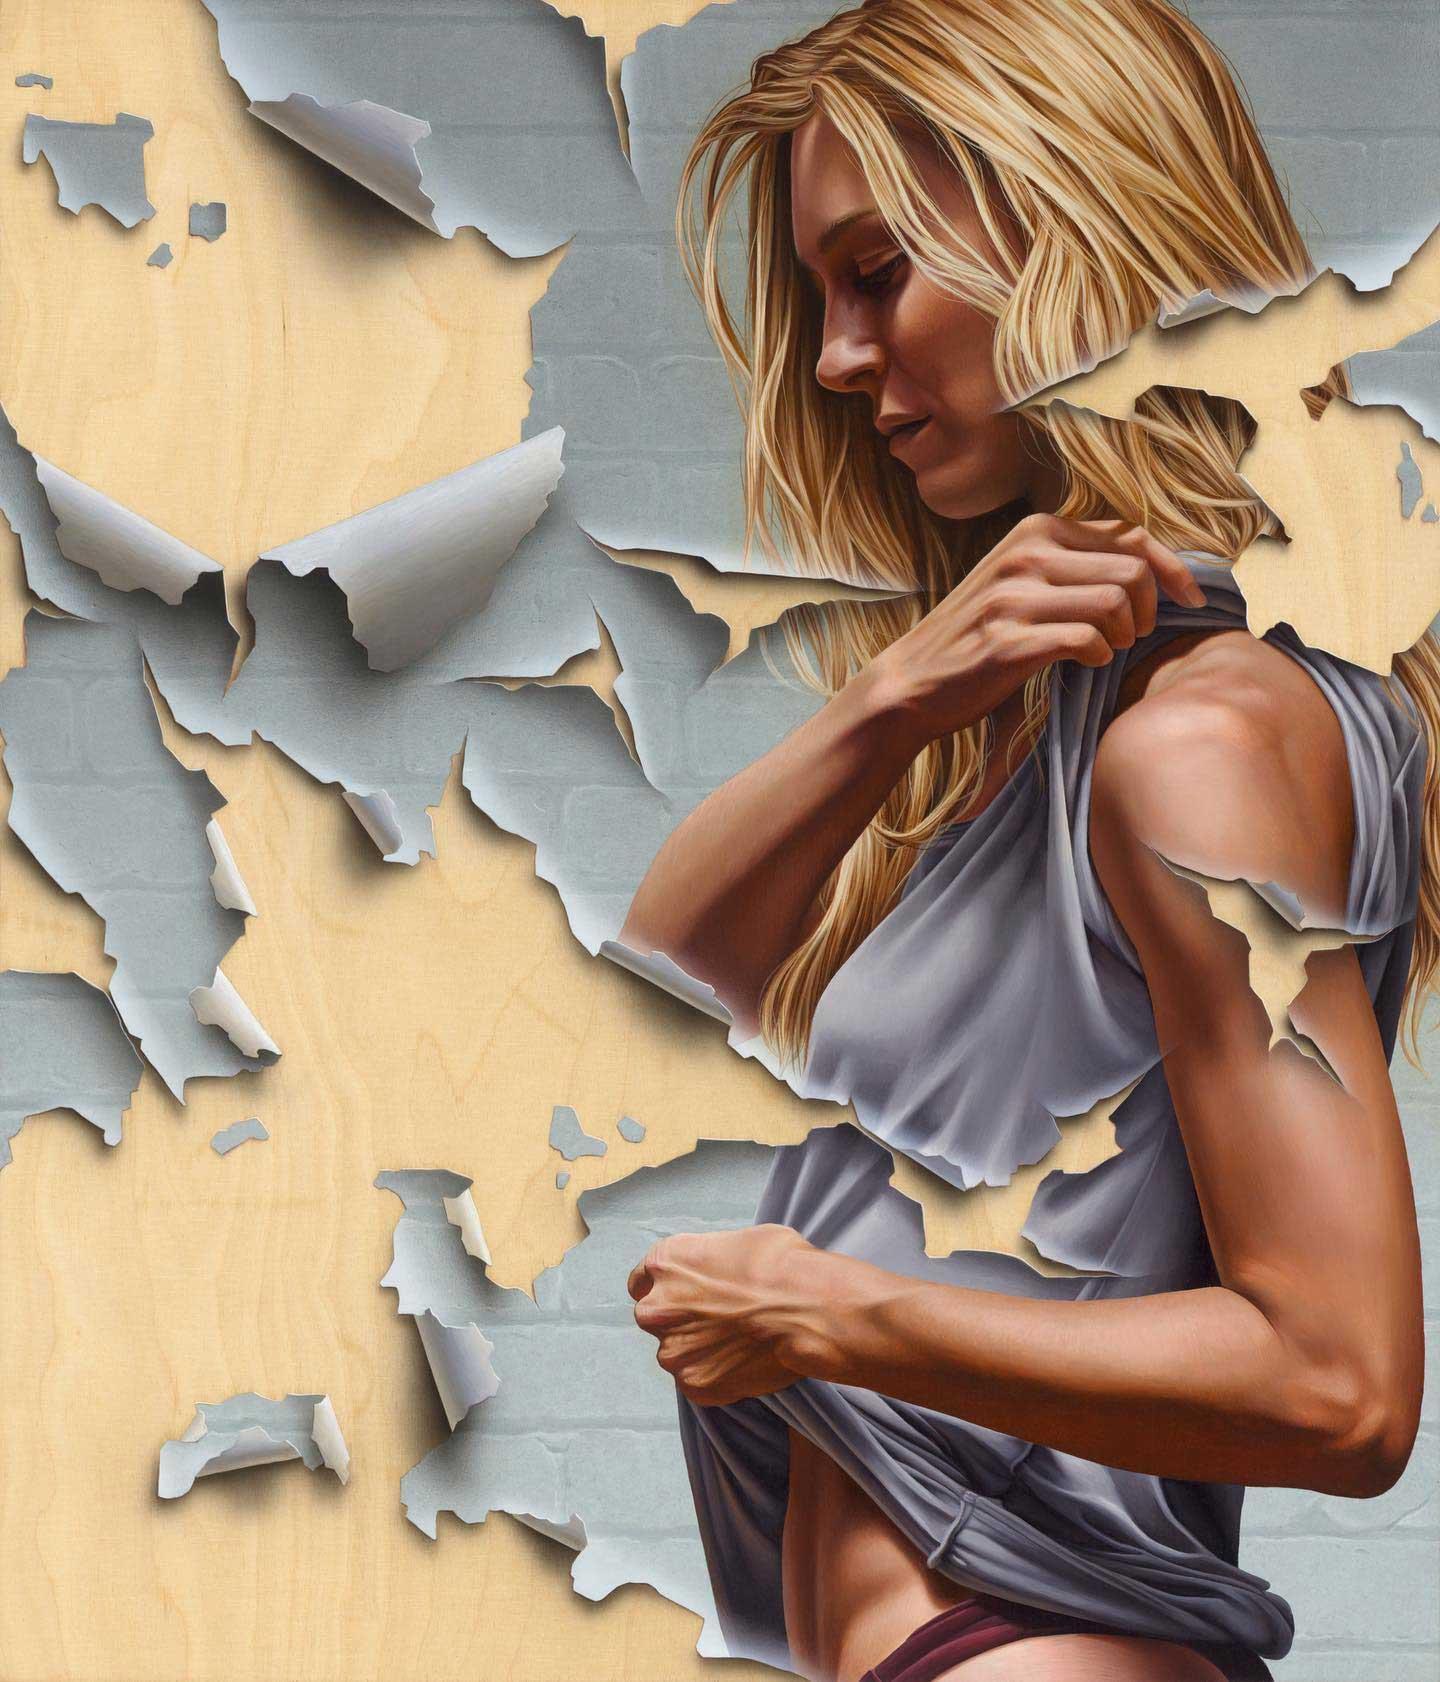 Abgeblätterte Gemälde von James Bullough James-Bullough-2020_02